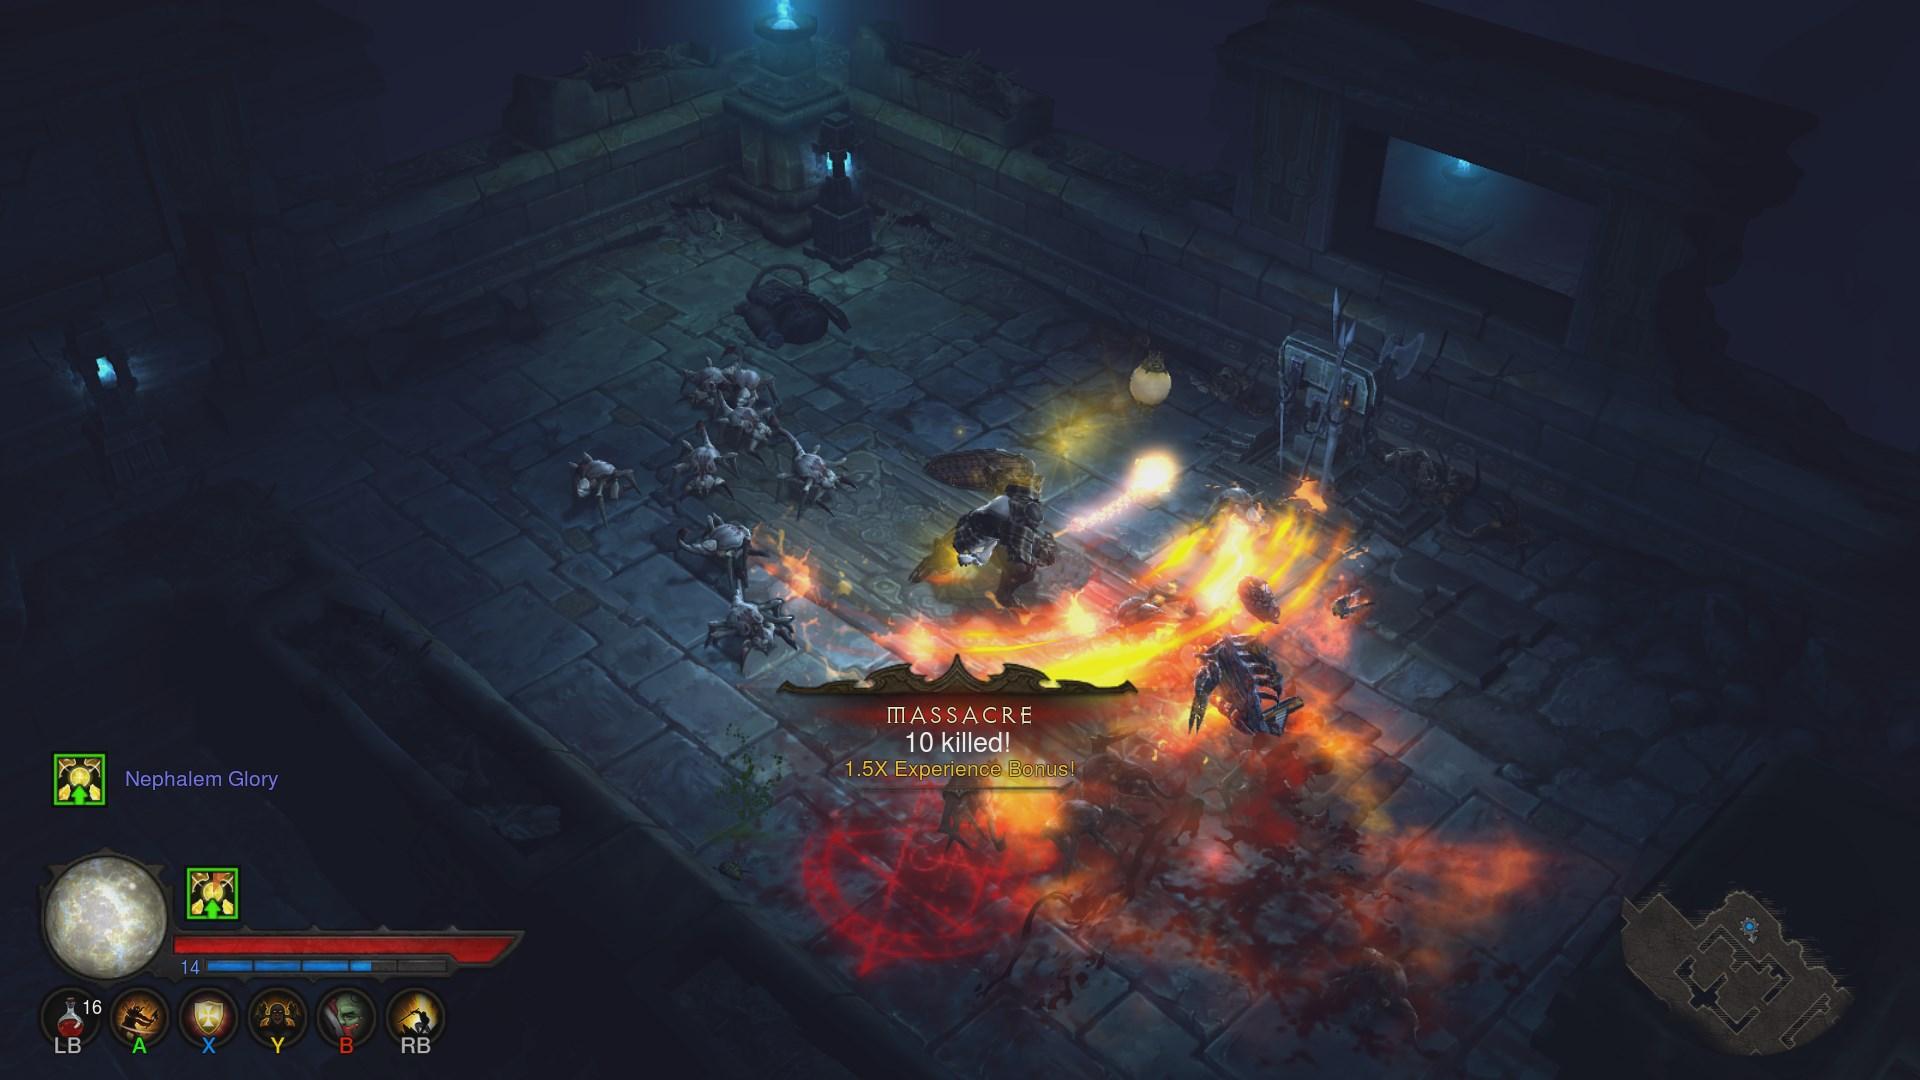 D3_x1_XboxOne_Massacre_x1_AD_03_png_jpgcopy